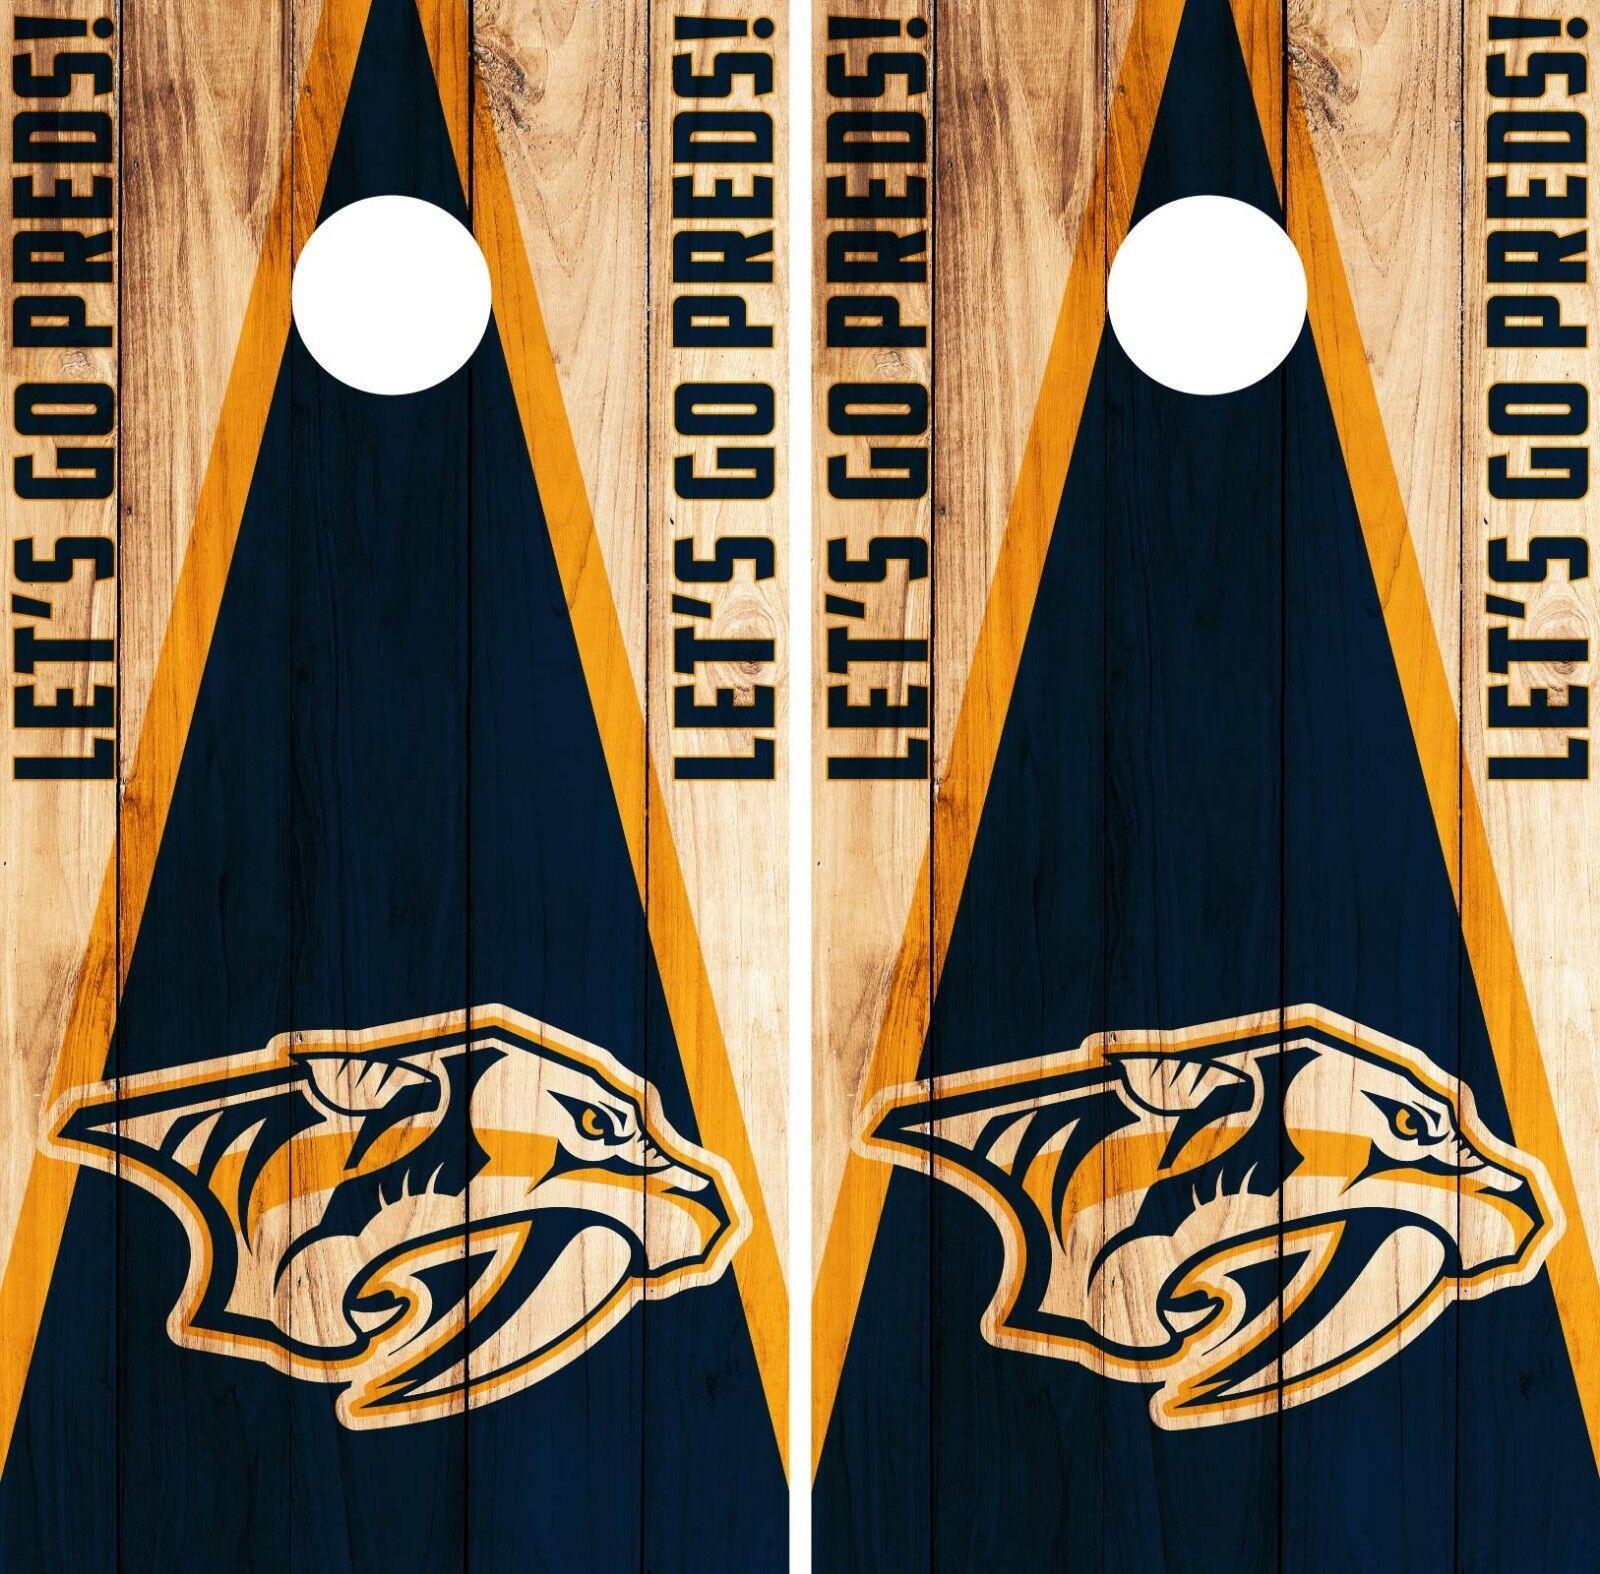 Nashville Predators Cornhole Wrap NHL Game  Board Skin Set Vinyl Decal Art CO354  choose your favorite